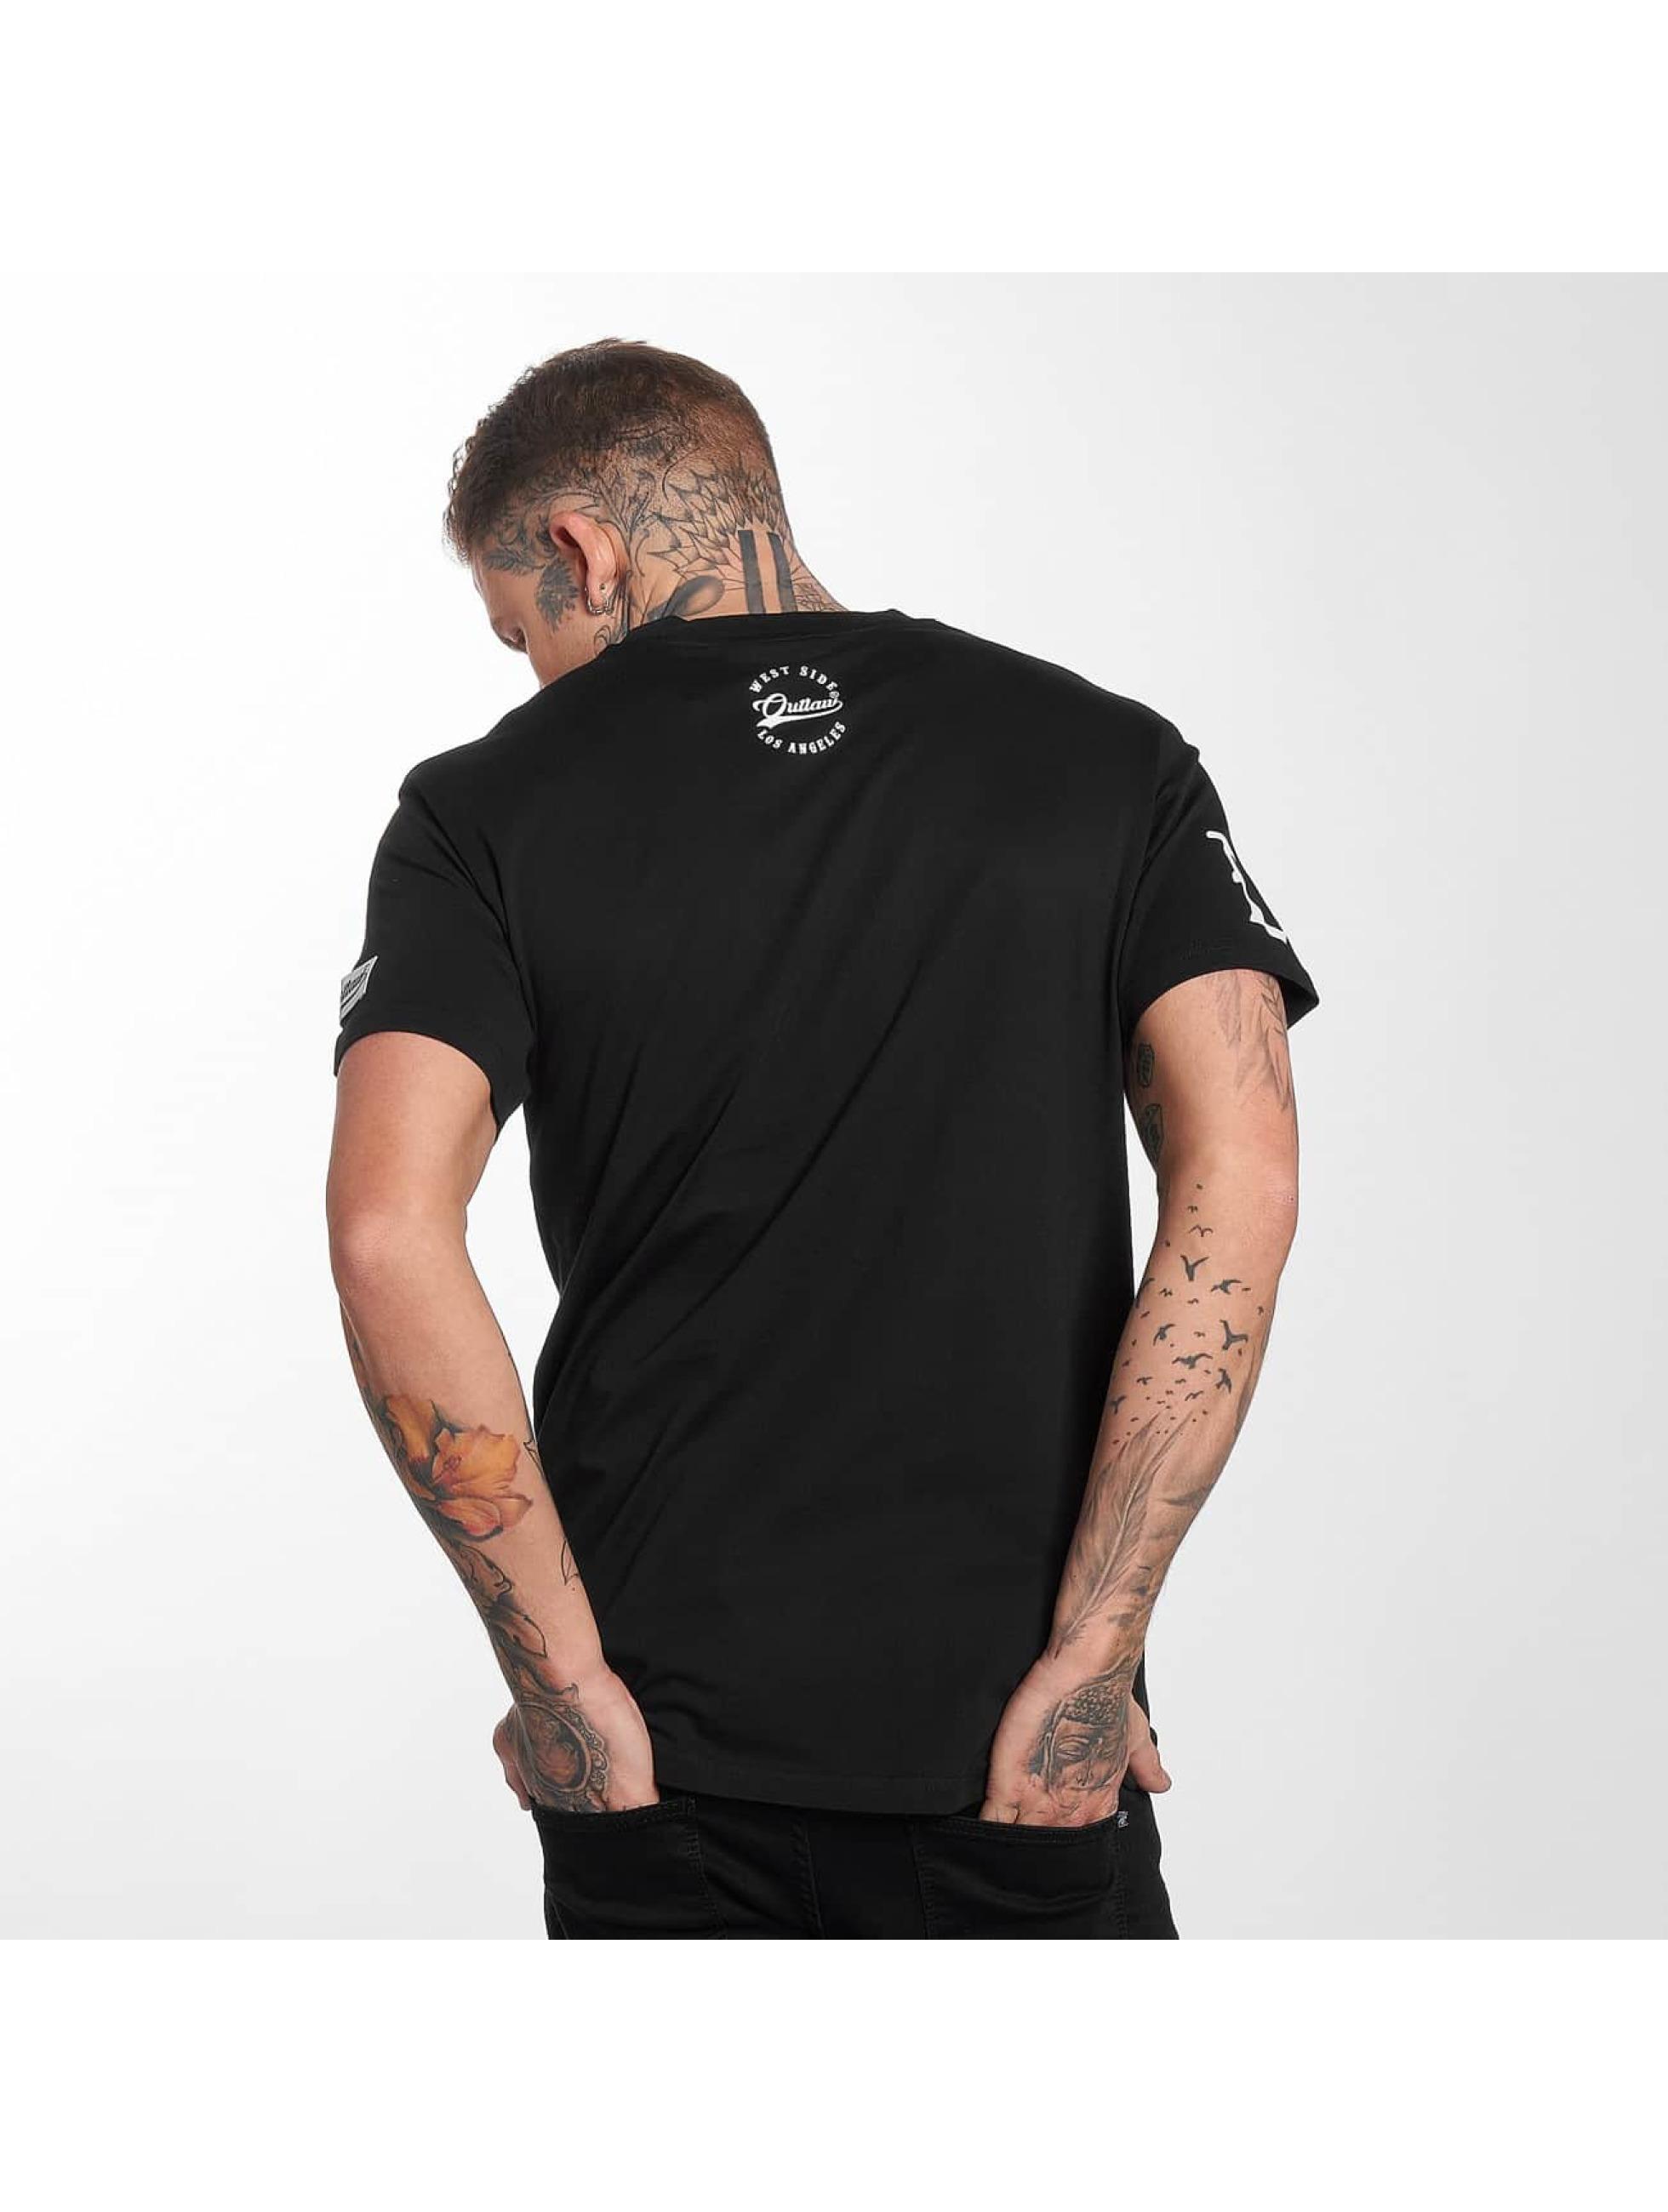 Outlaw T-Shirt Outlaw Run noir